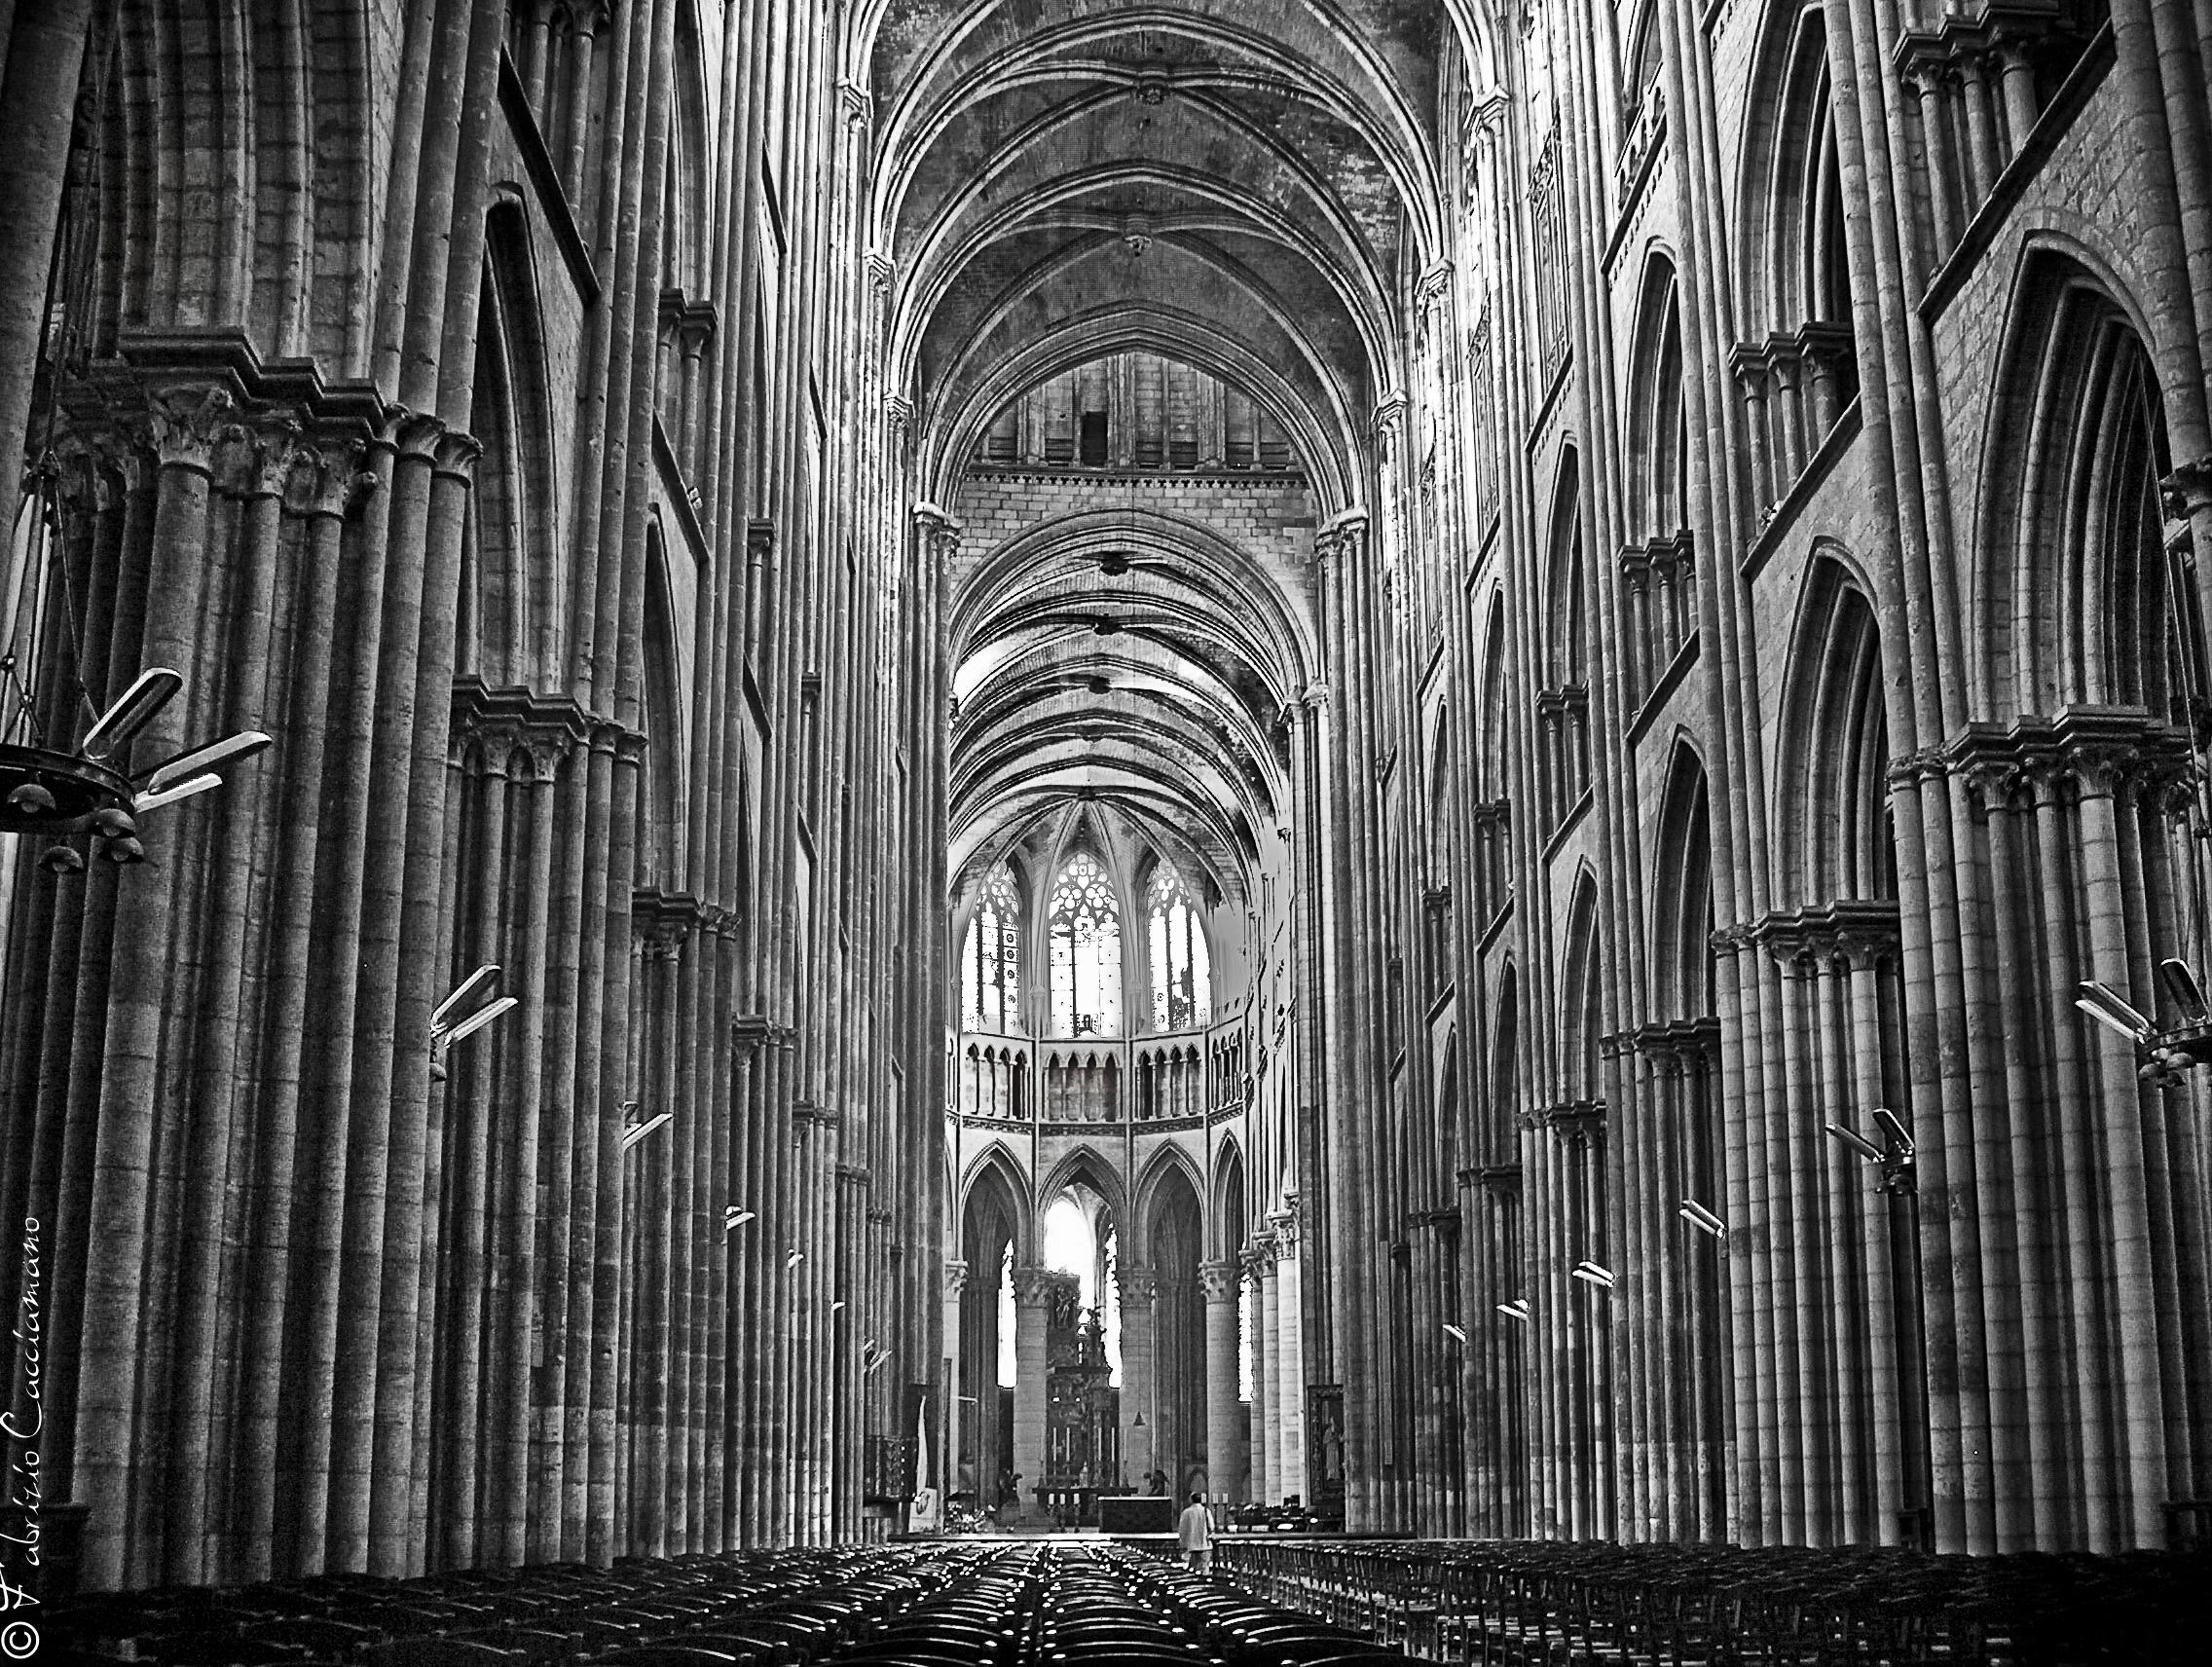 Interno cattedrale di Ruen (Francia)...